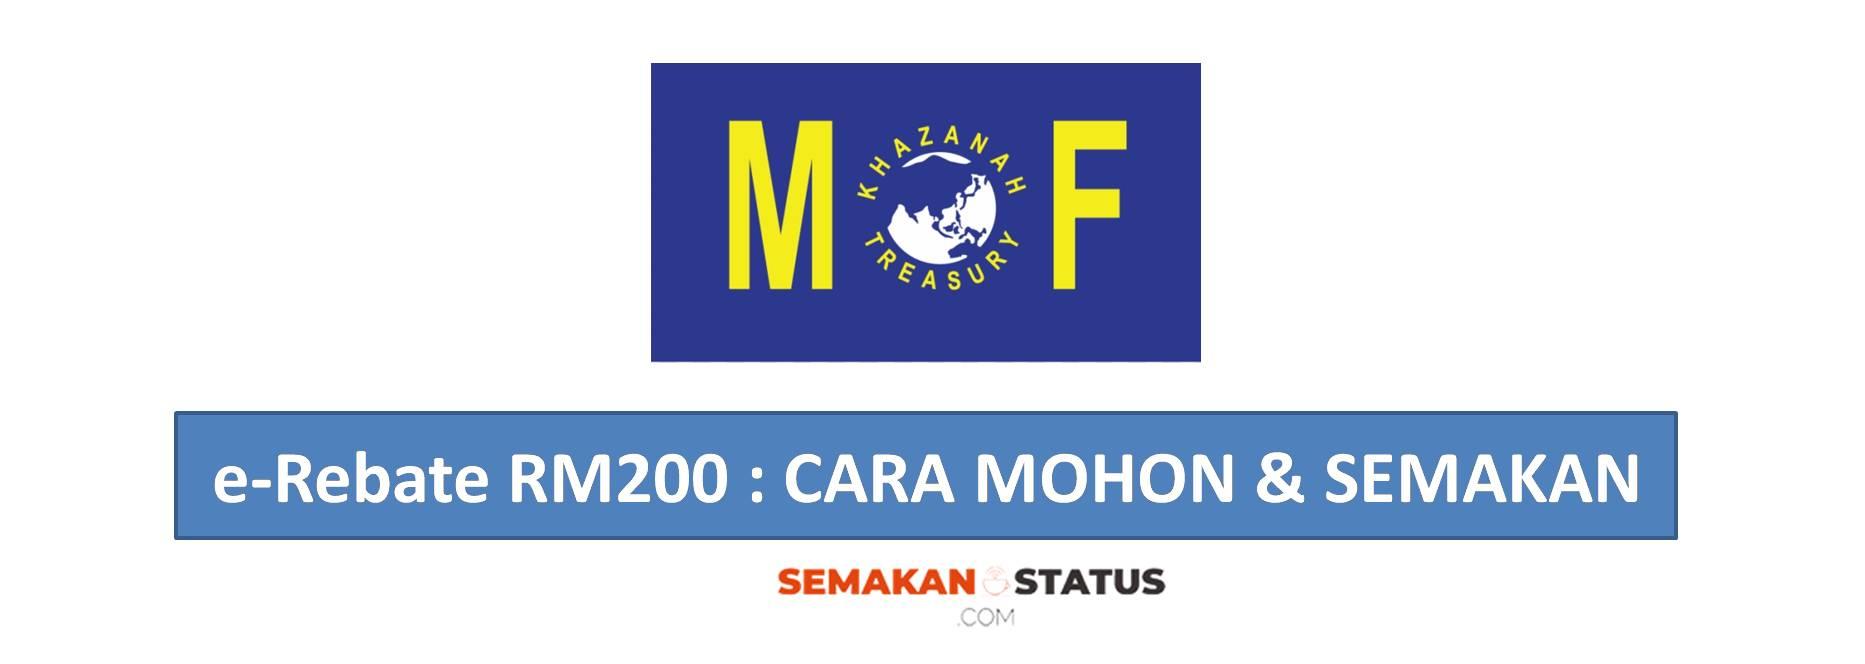 e-Rebate RM200 : CARA MOHON & SEMAKAN